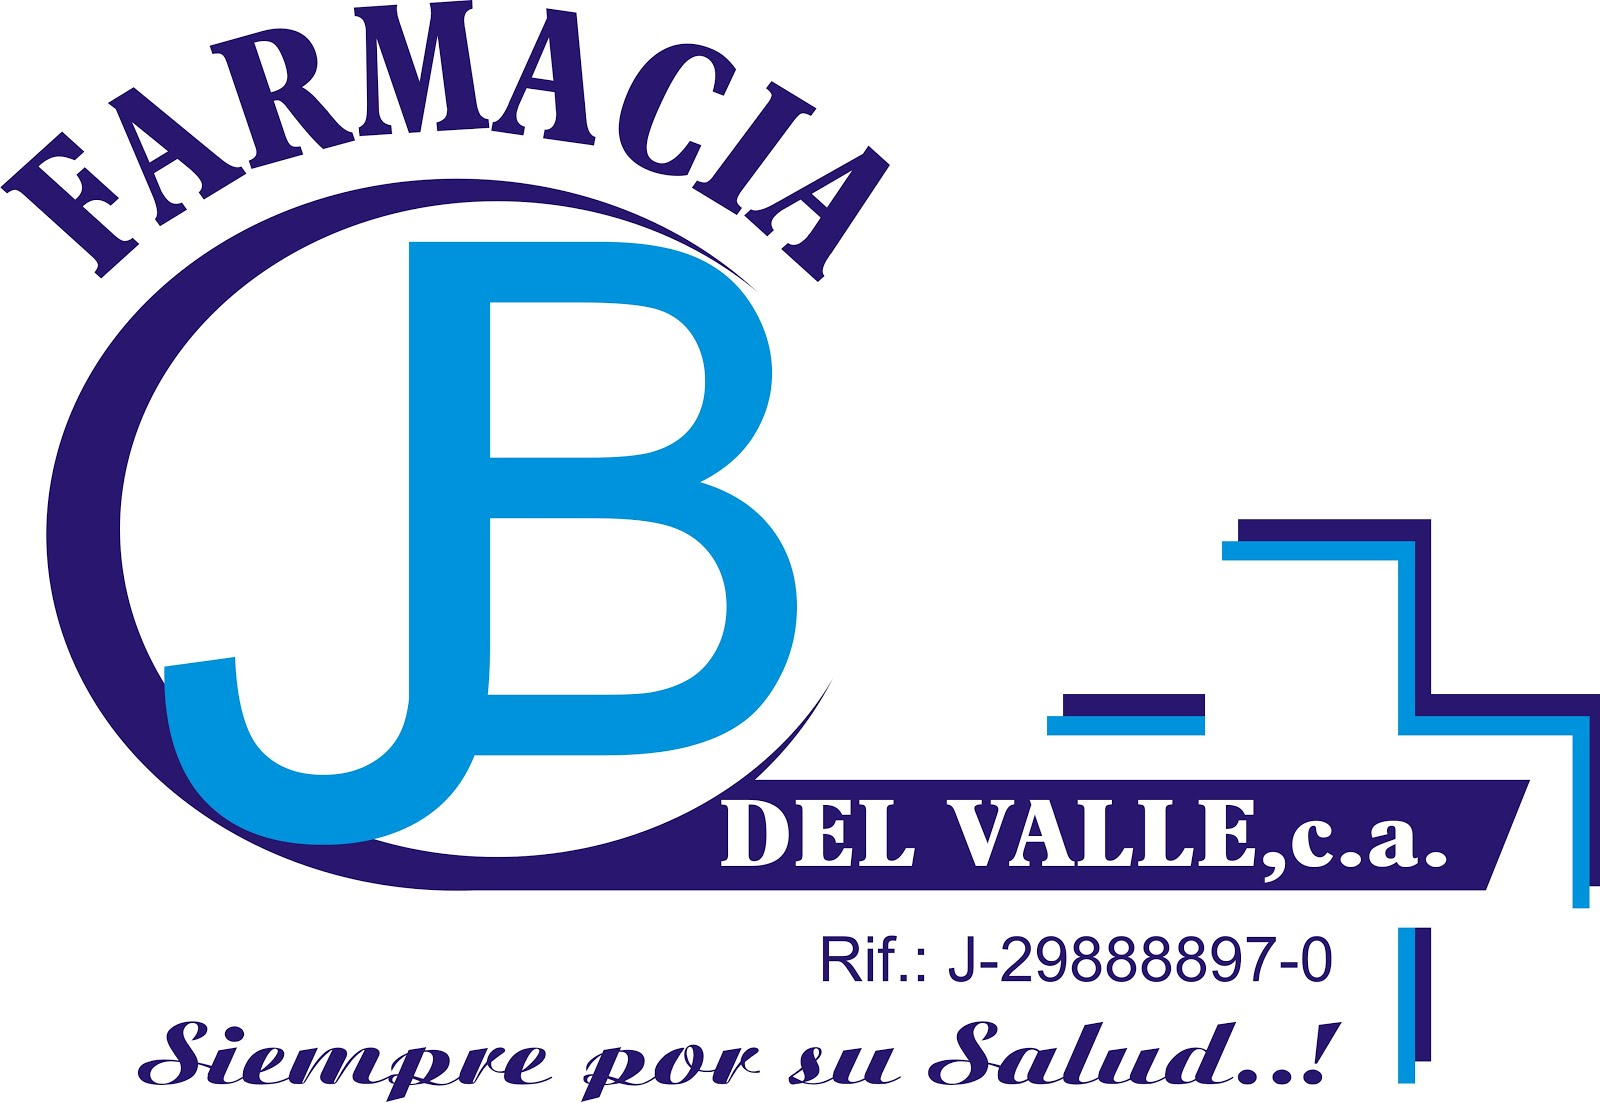 FARMACIA JB DEL VALLE, C.A